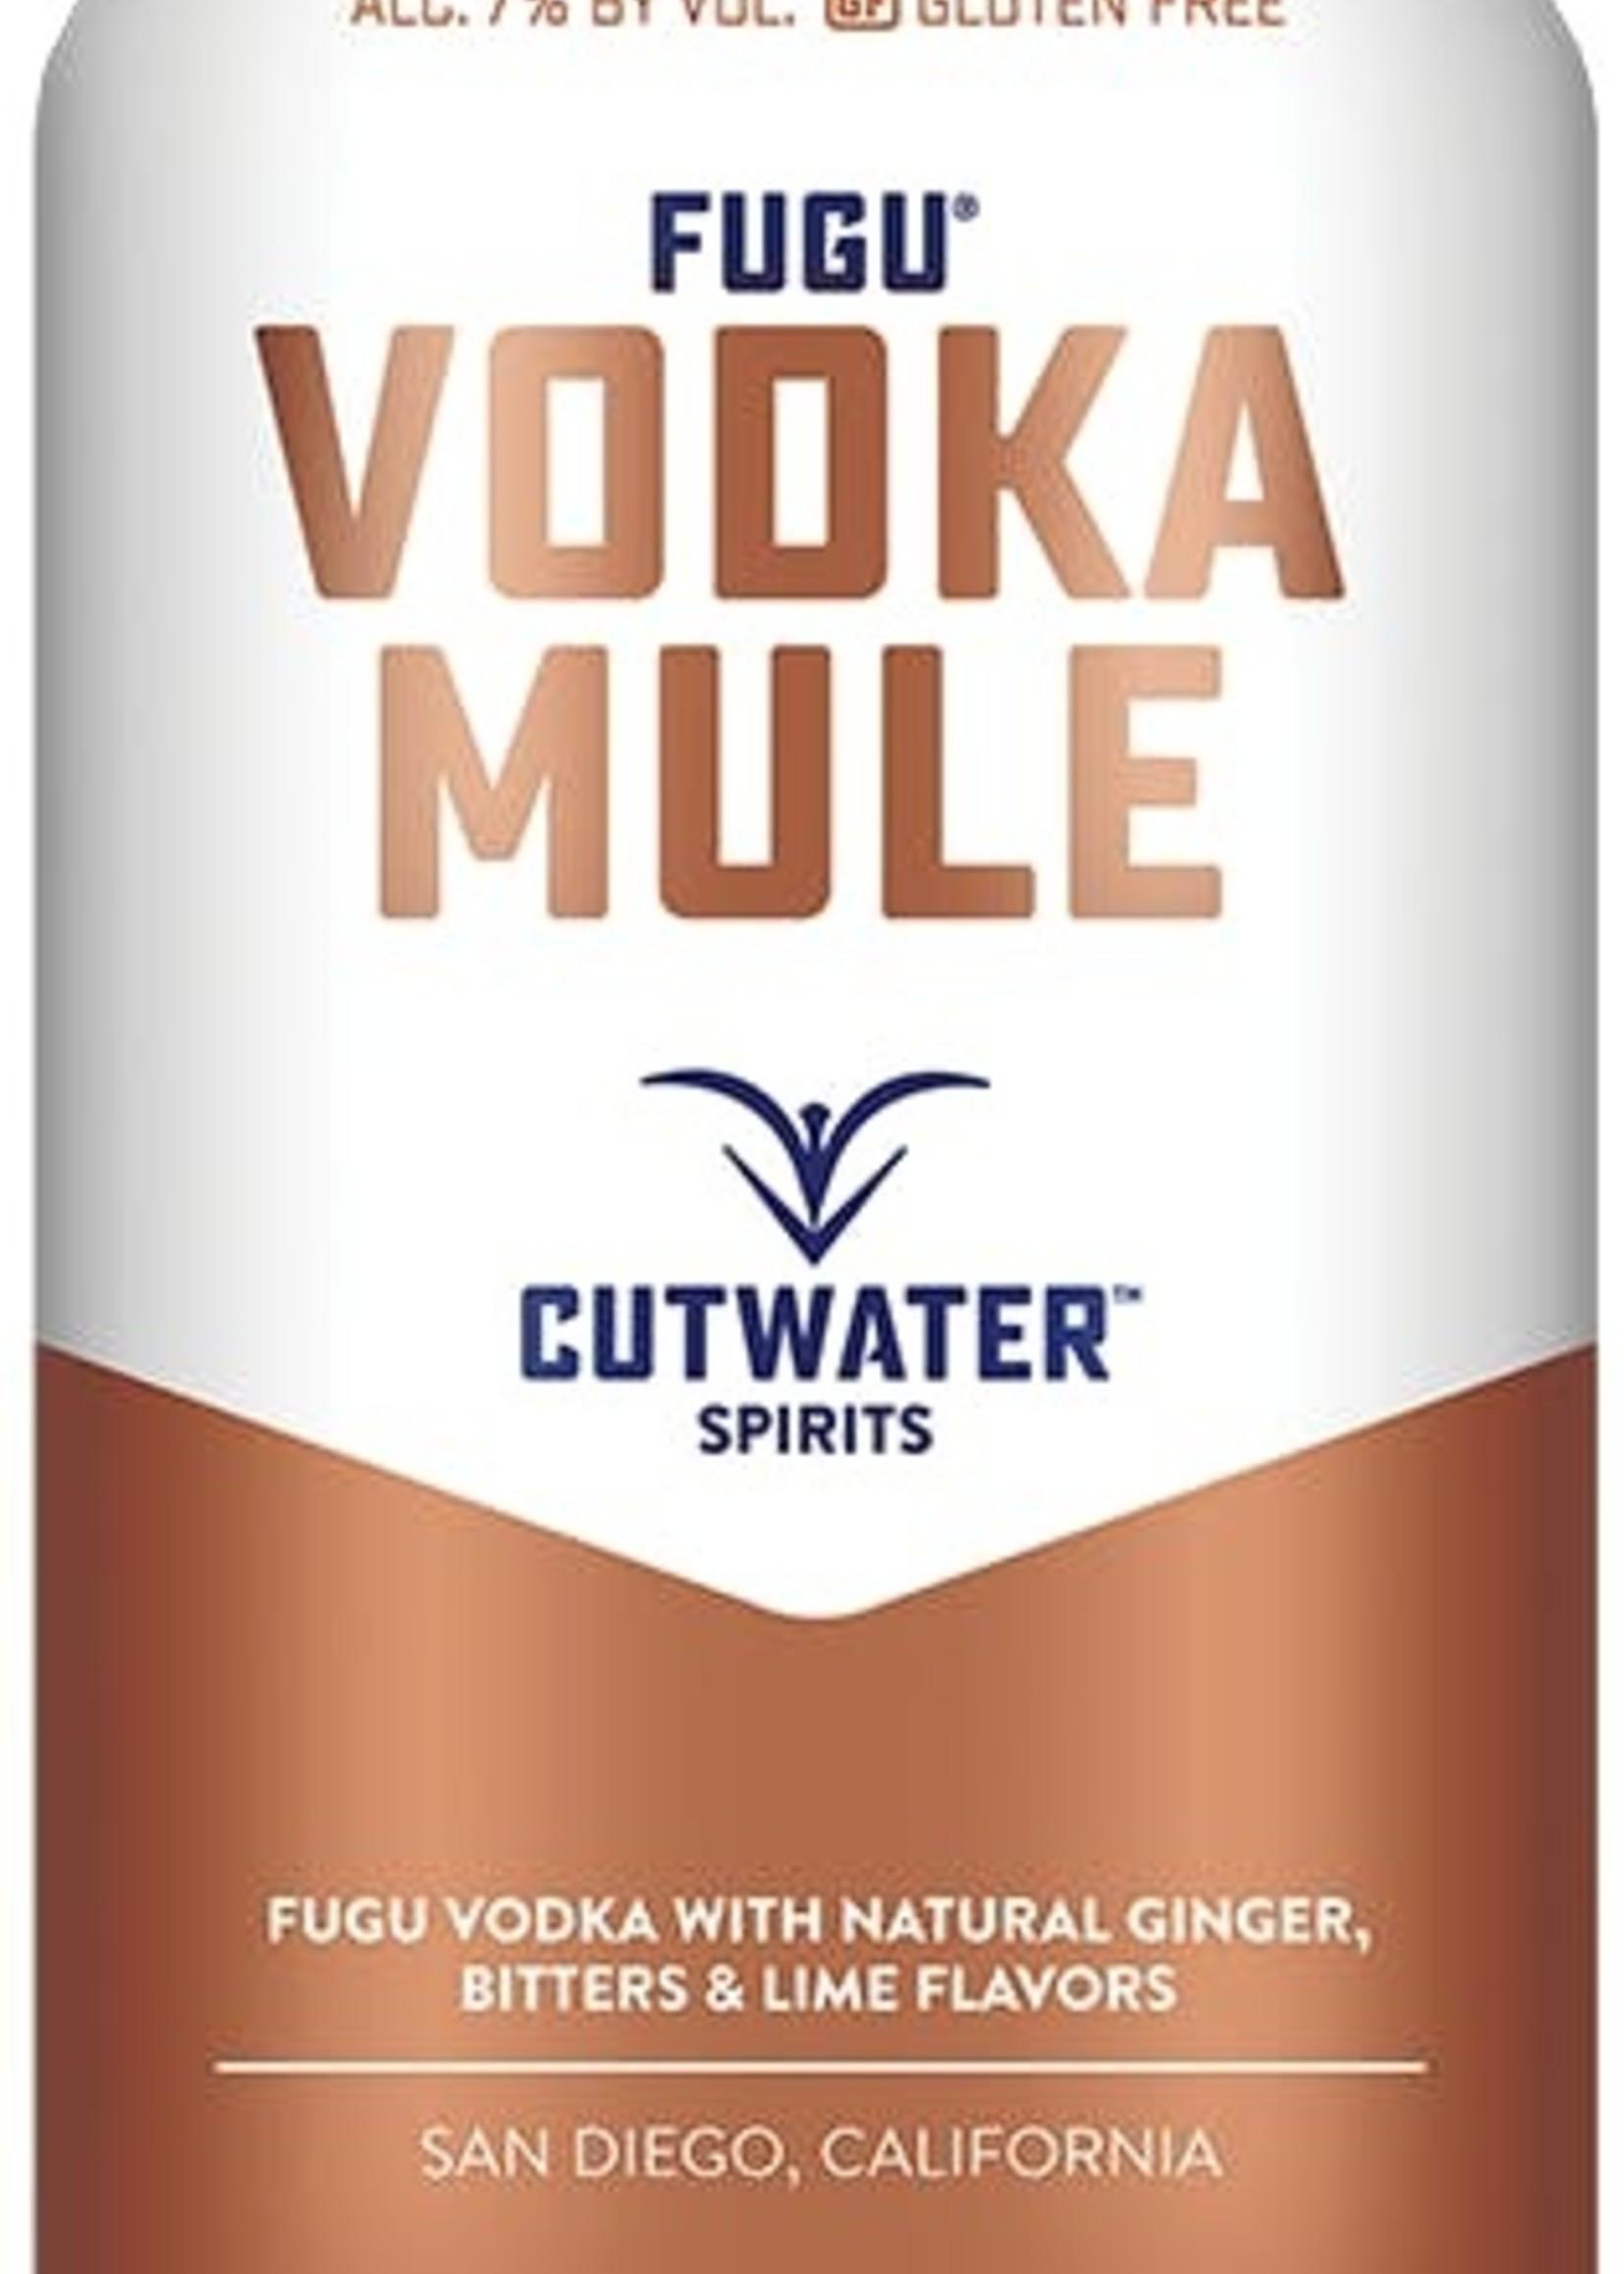 Cutwater Vodka Mule - 4x12oz Cans